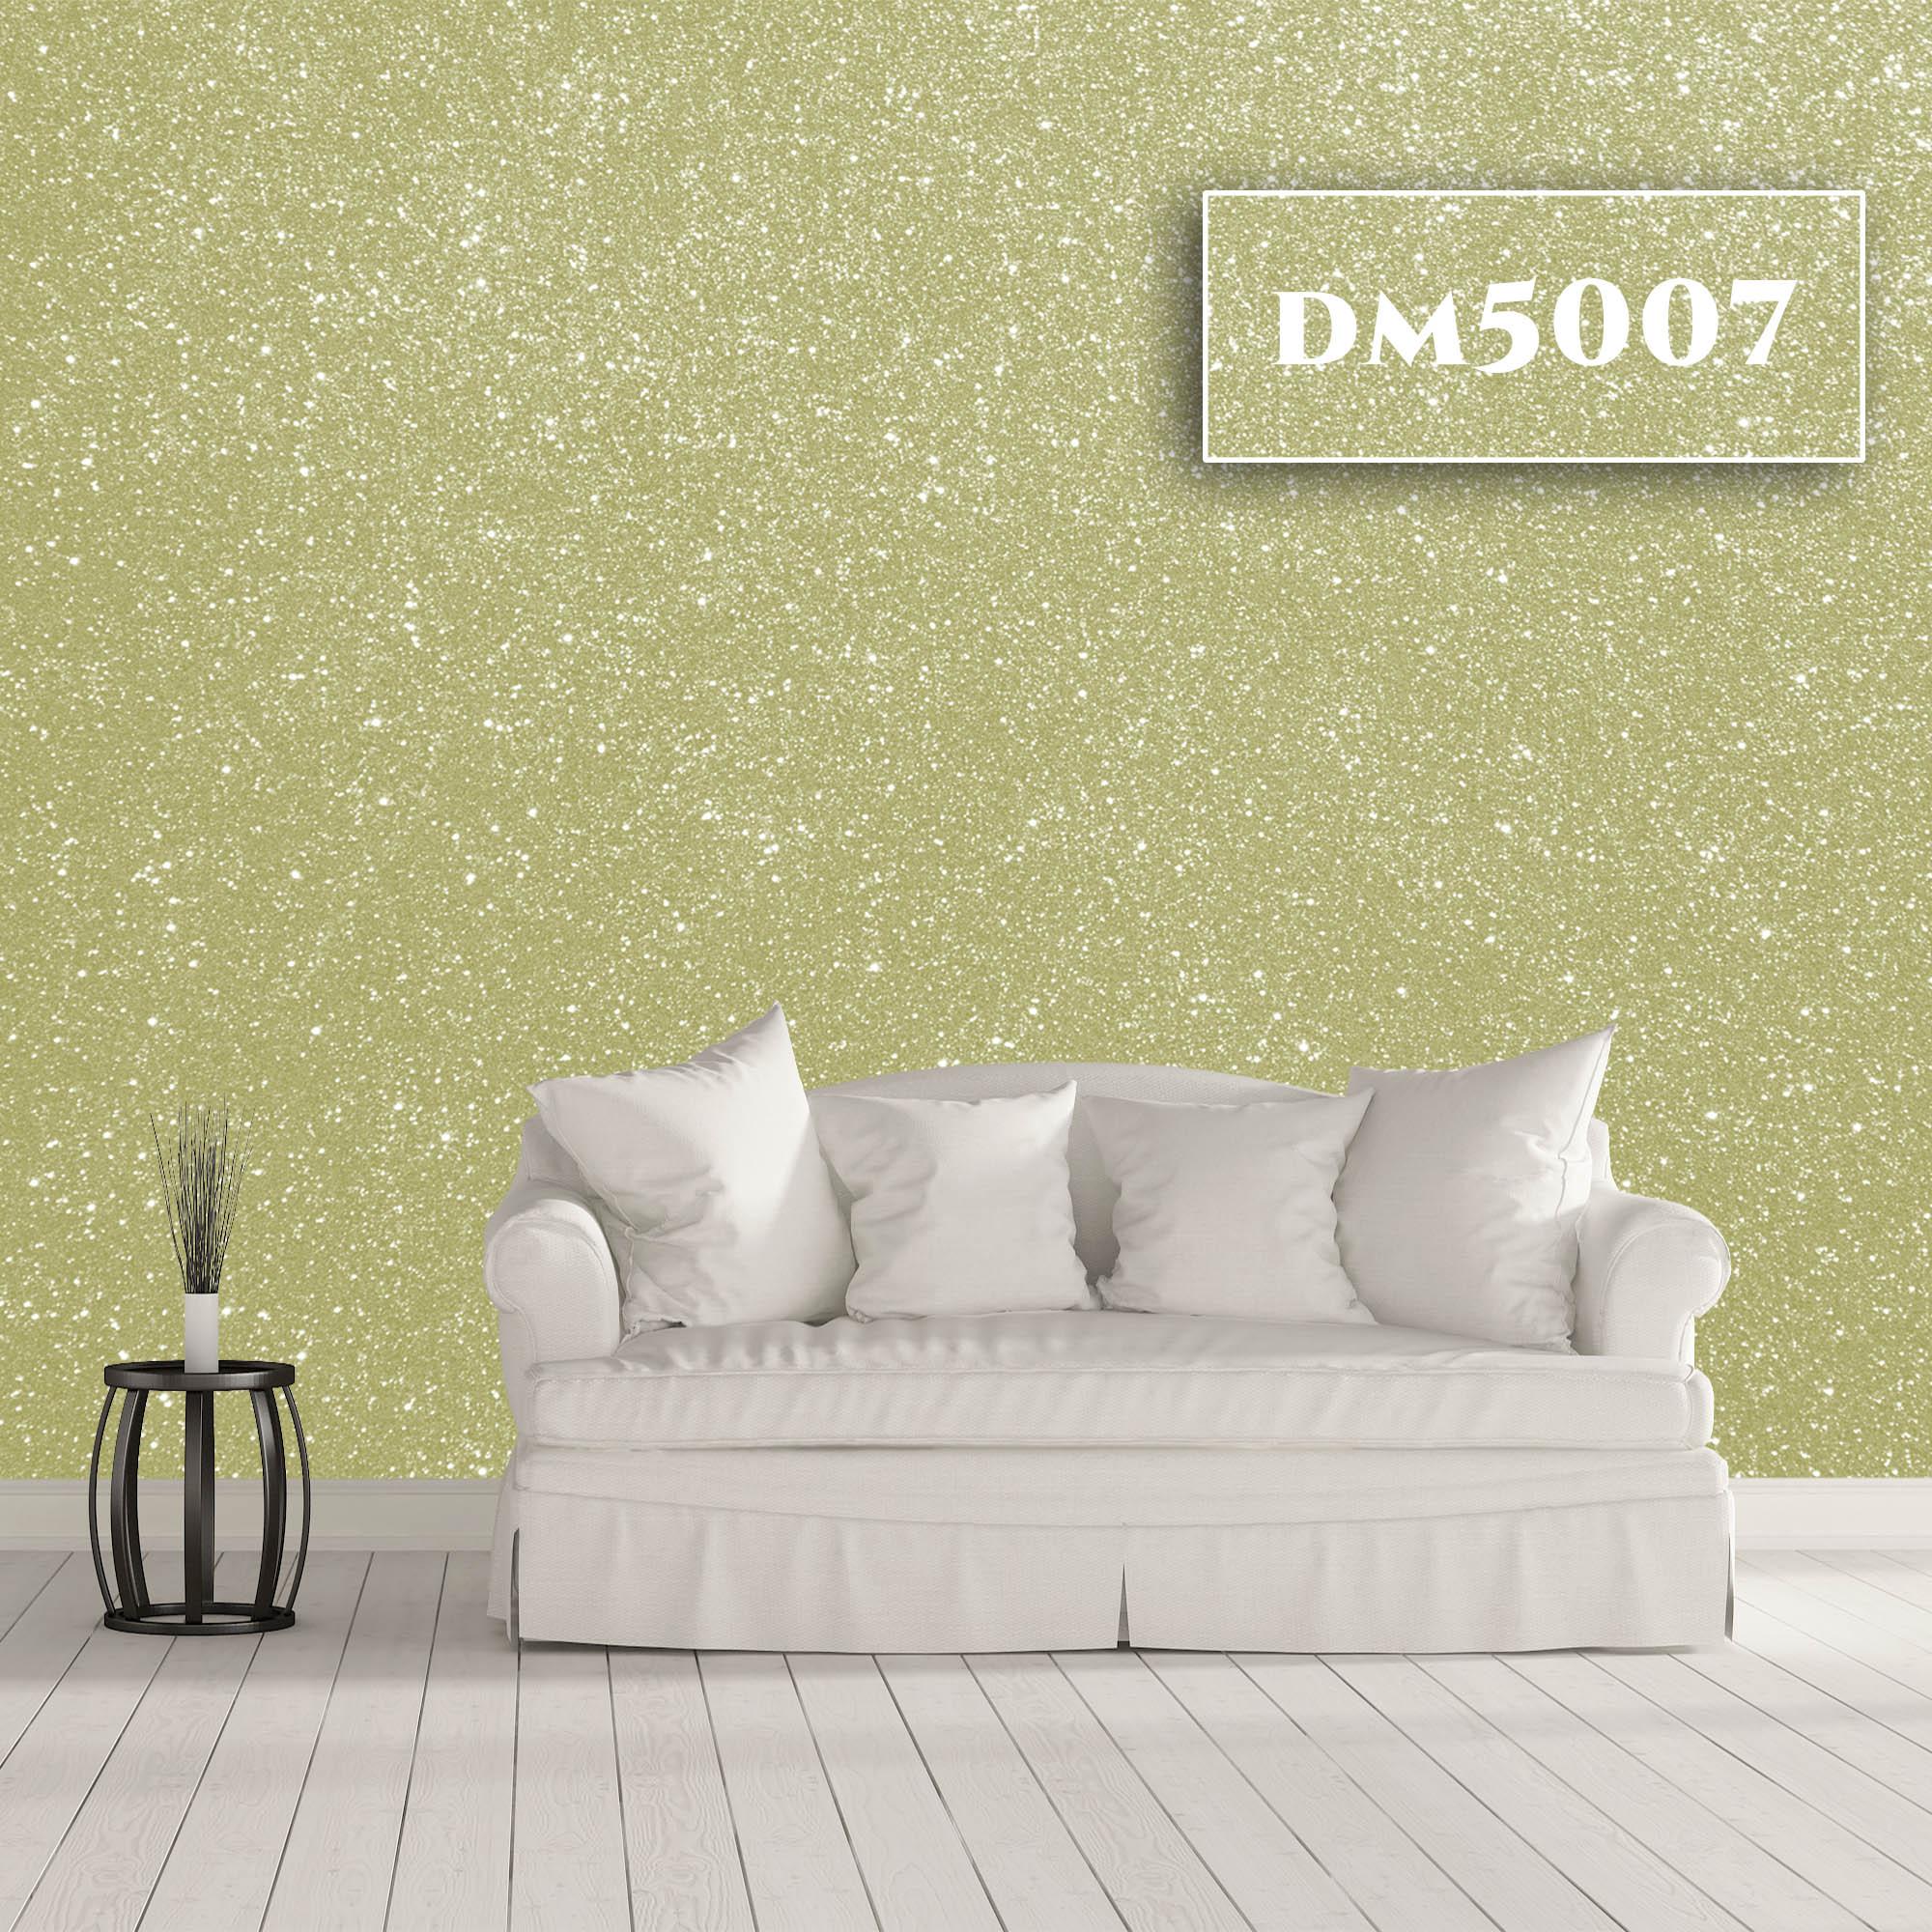 DM5007